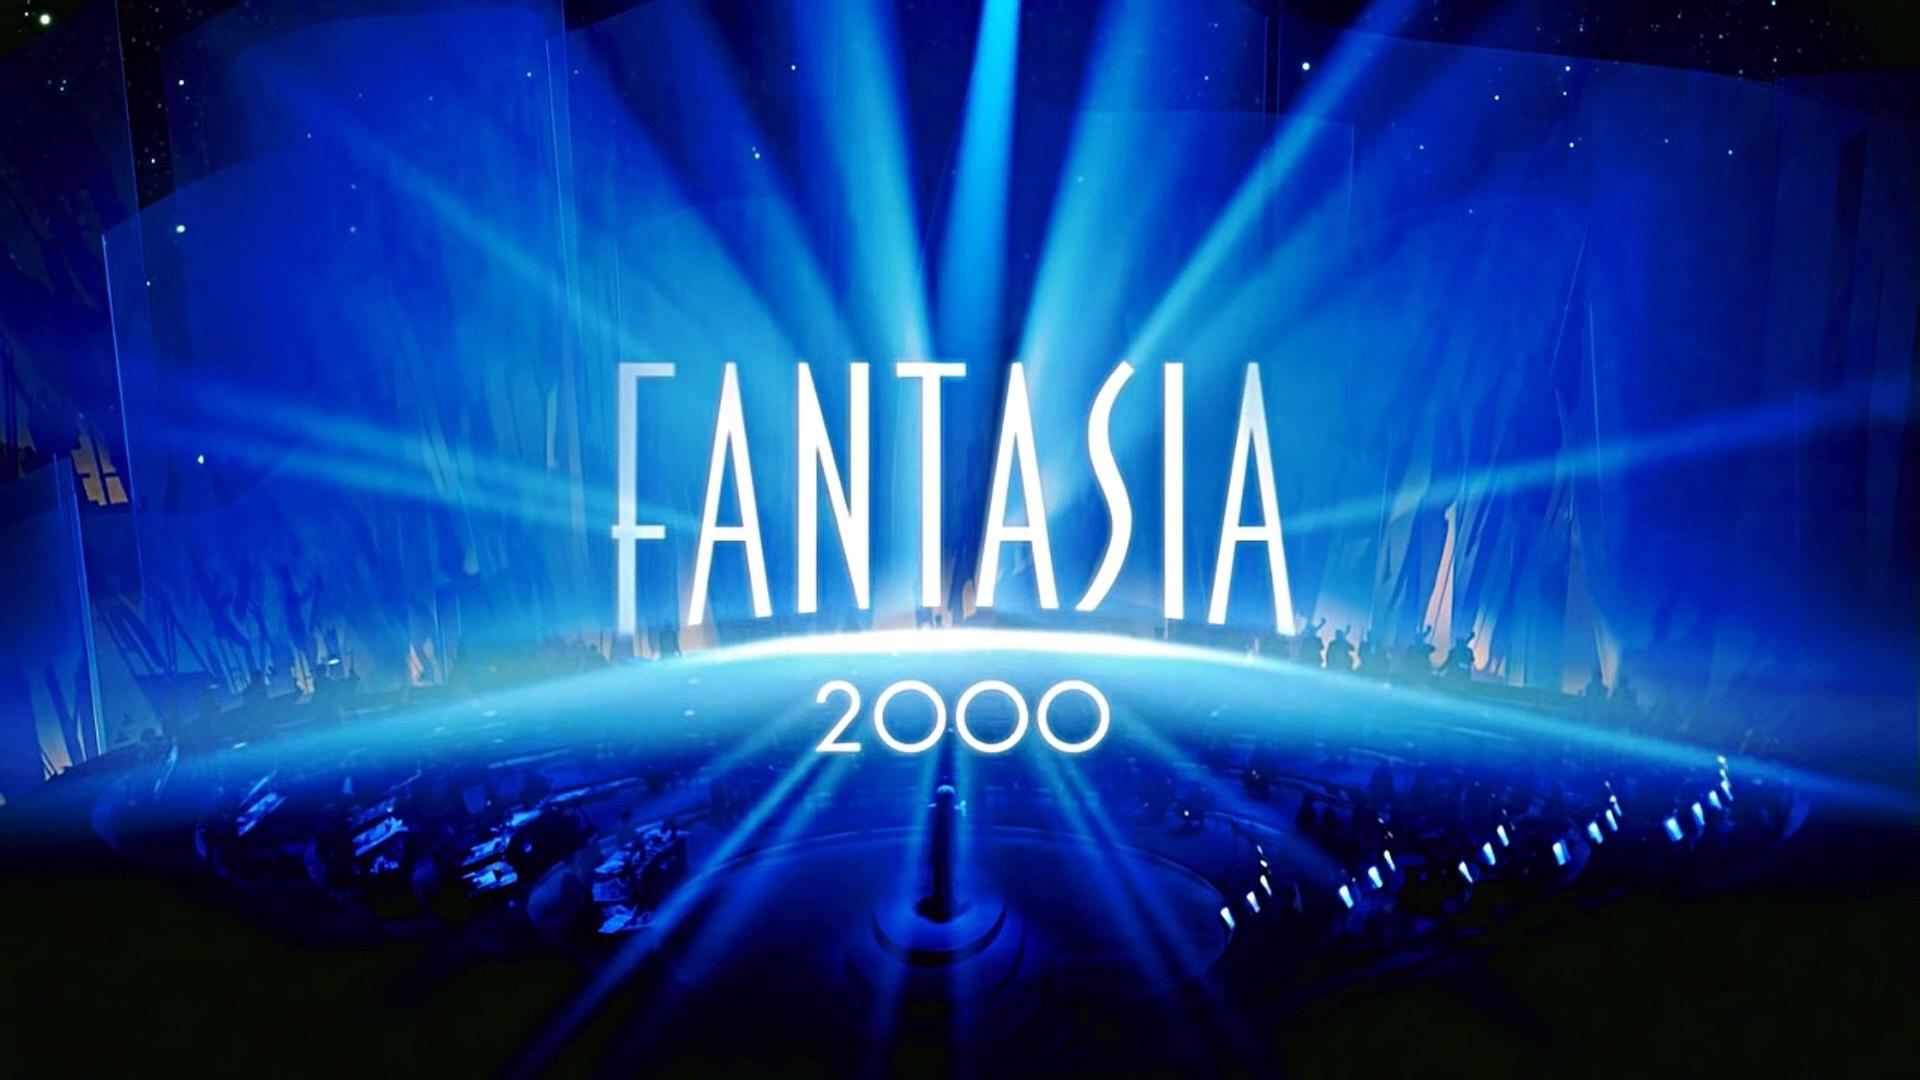 Fantasia 2000 - Rhapsody in Blue (Film Version)